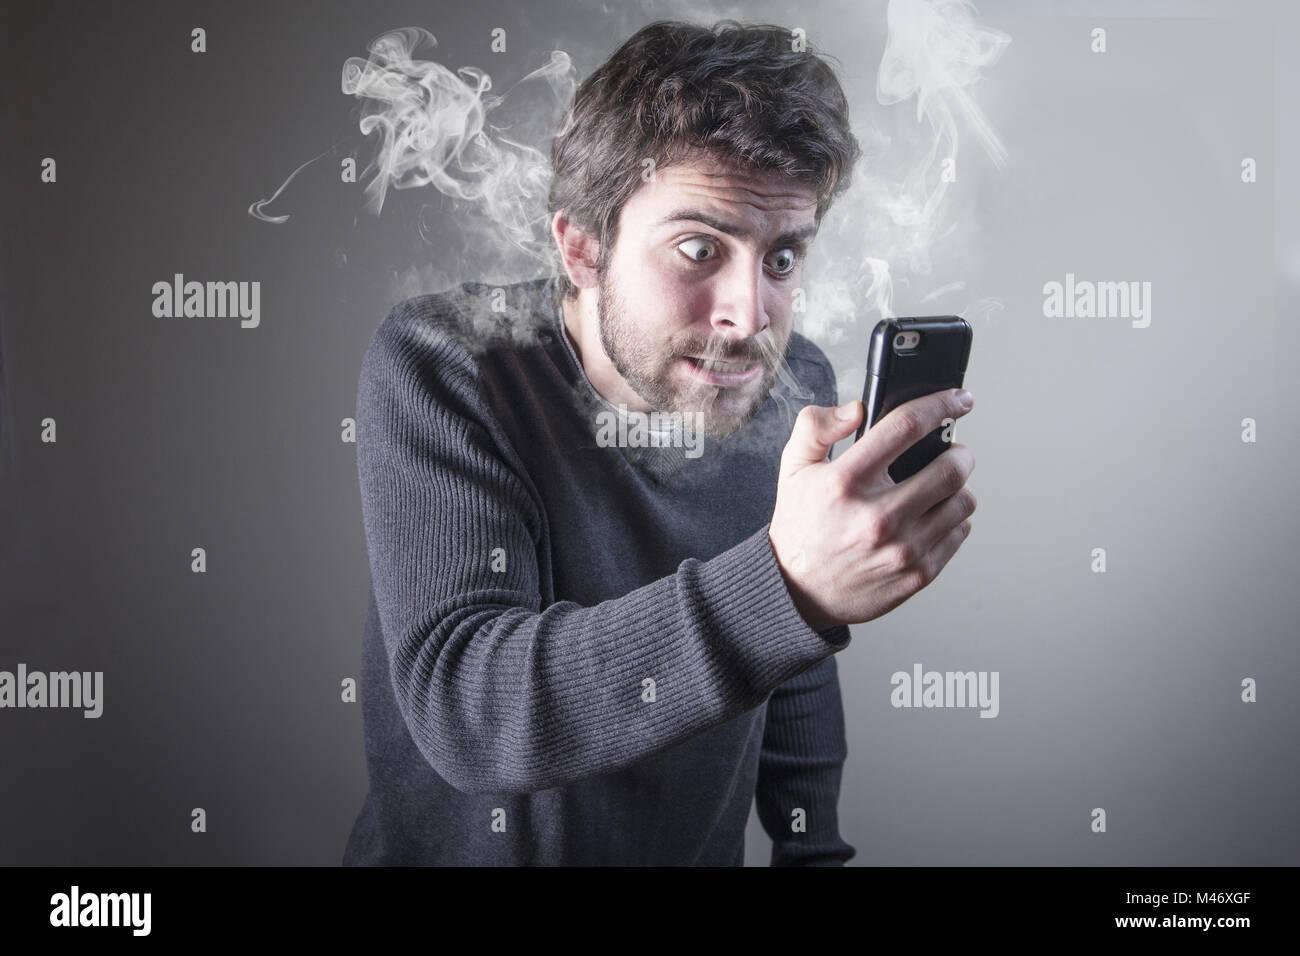 Man furious with his phone smoking with rage - Stock Image